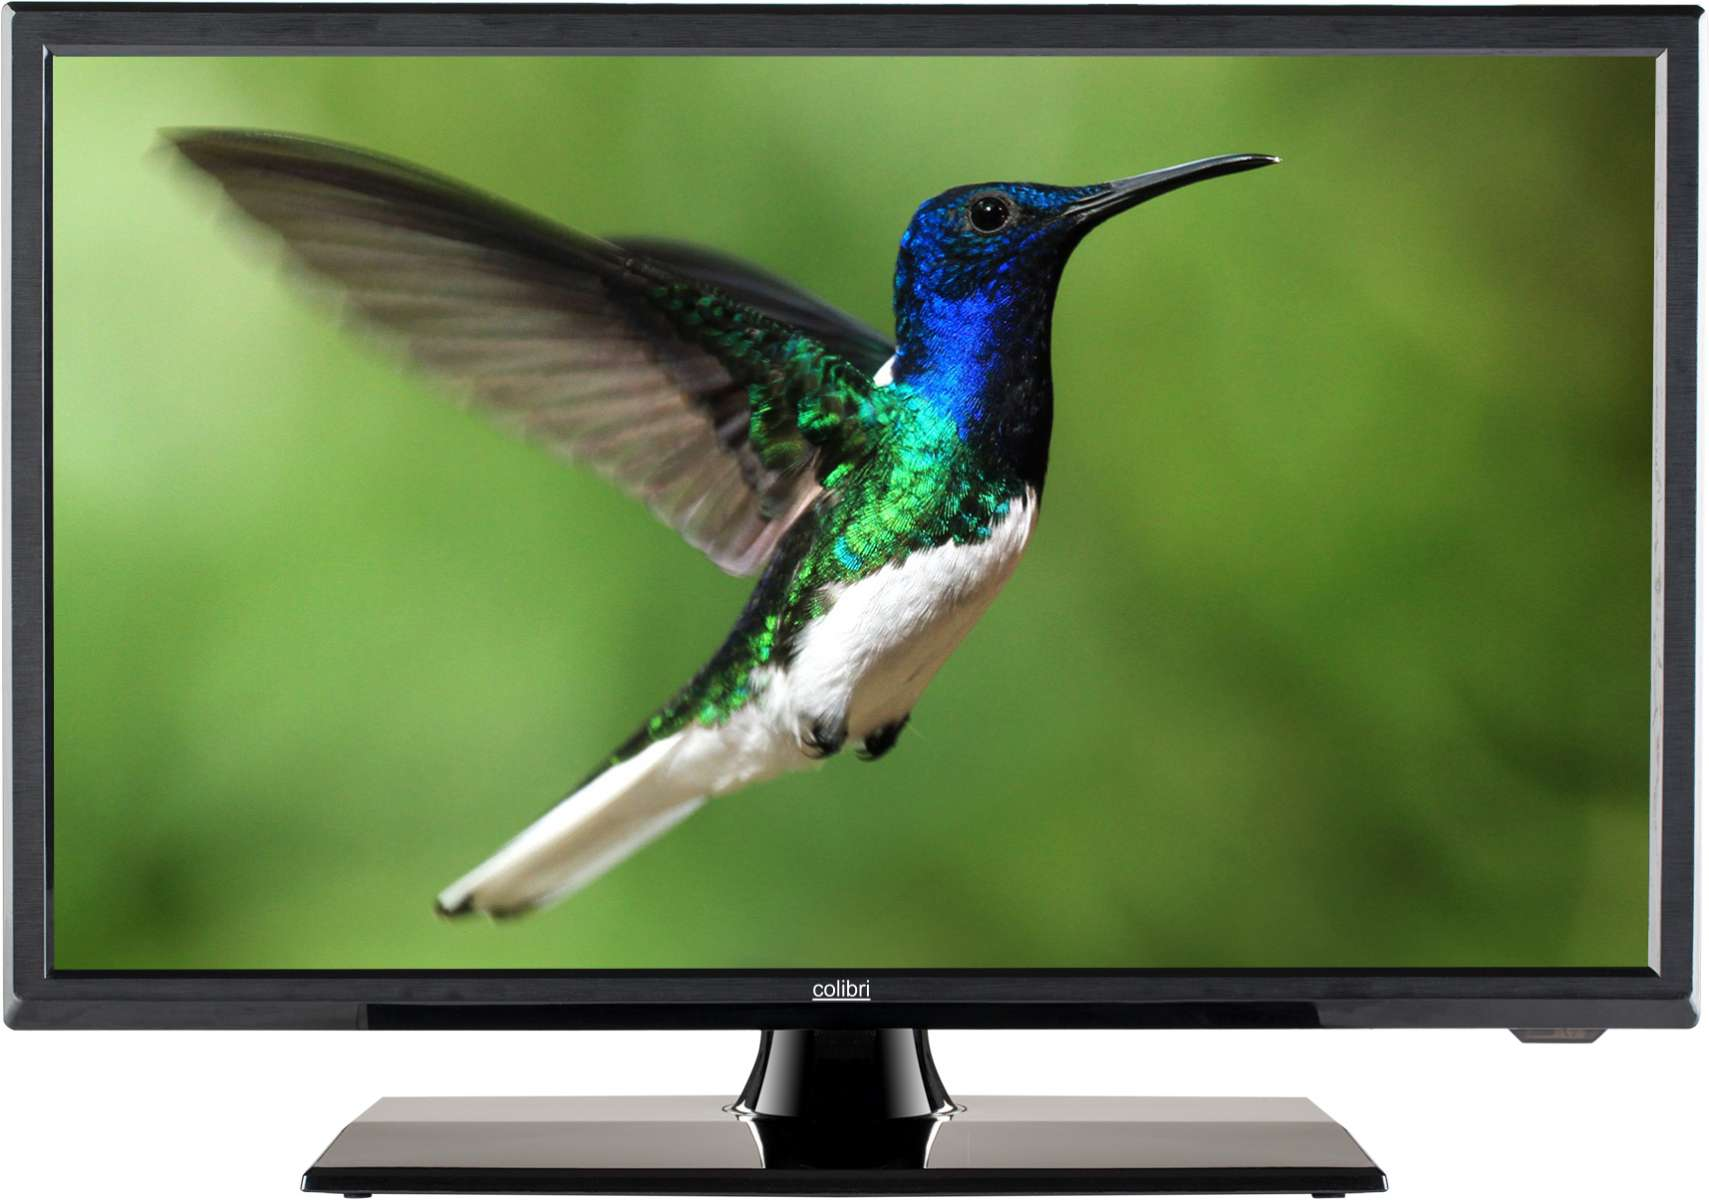 Colibri LED-Fernseher 5322